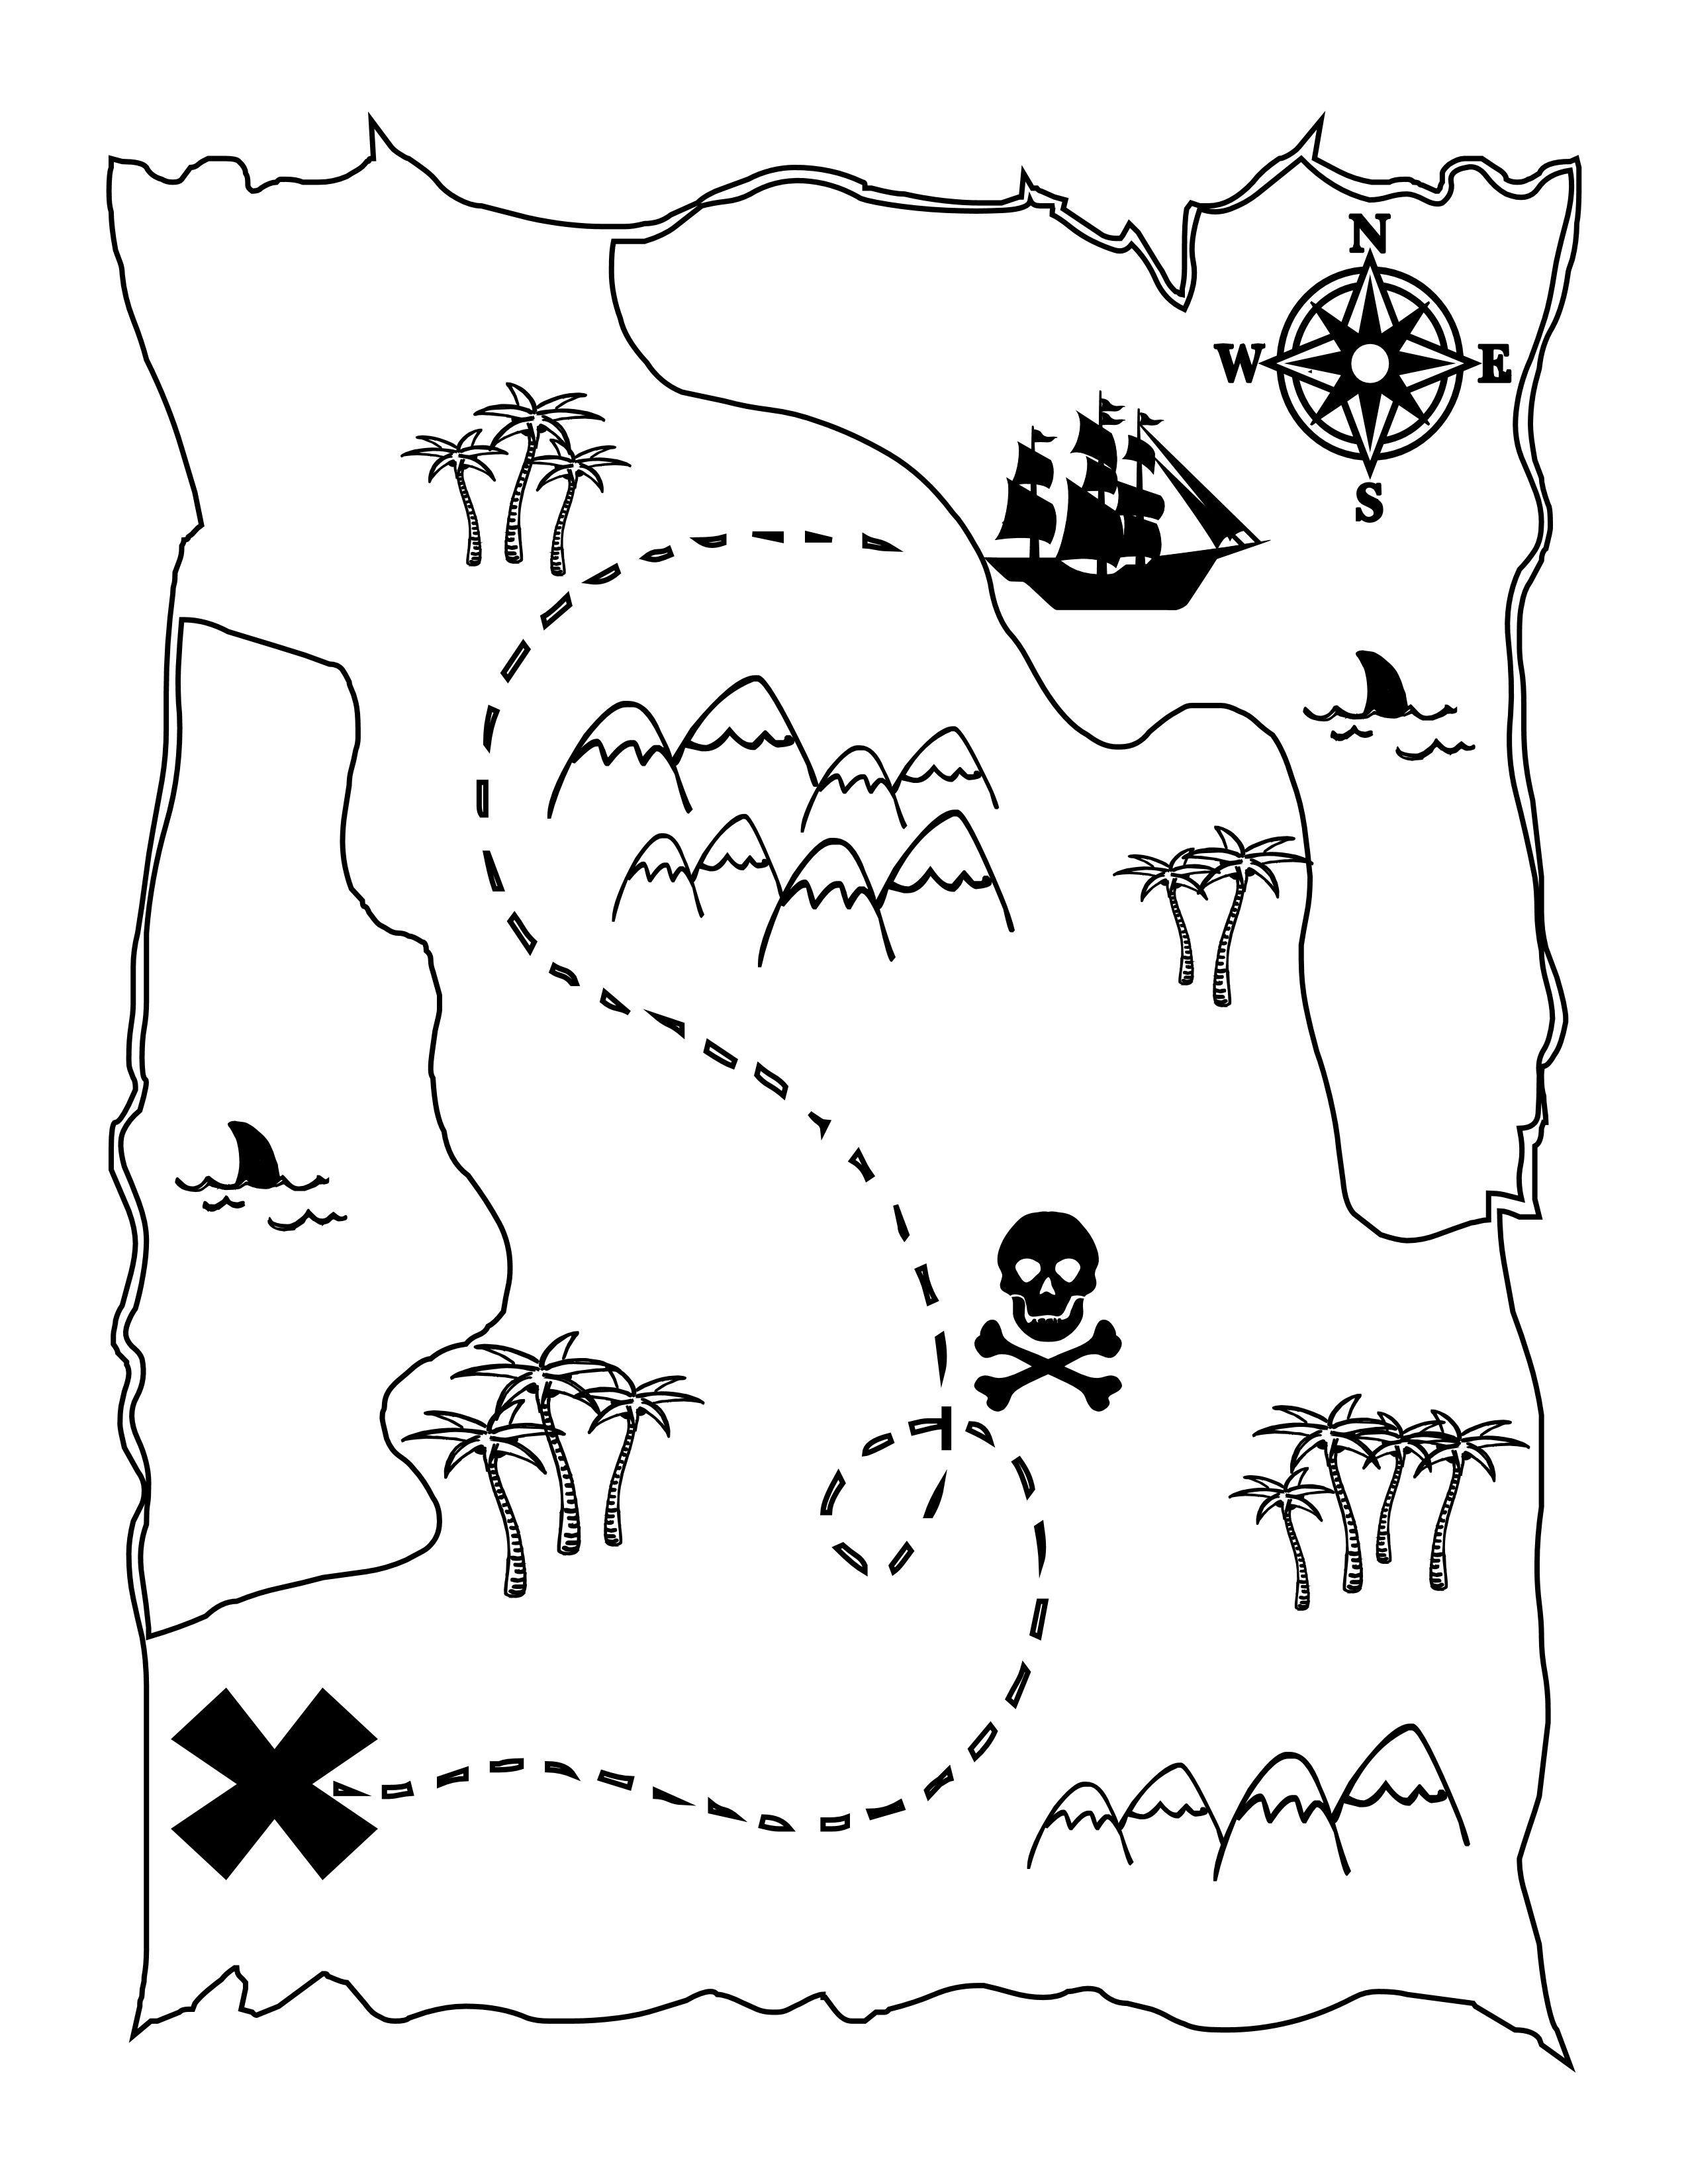 Printable Treasure Map Kids Activity | Printables | Pirate Maps - Free Printable Pirate Maps